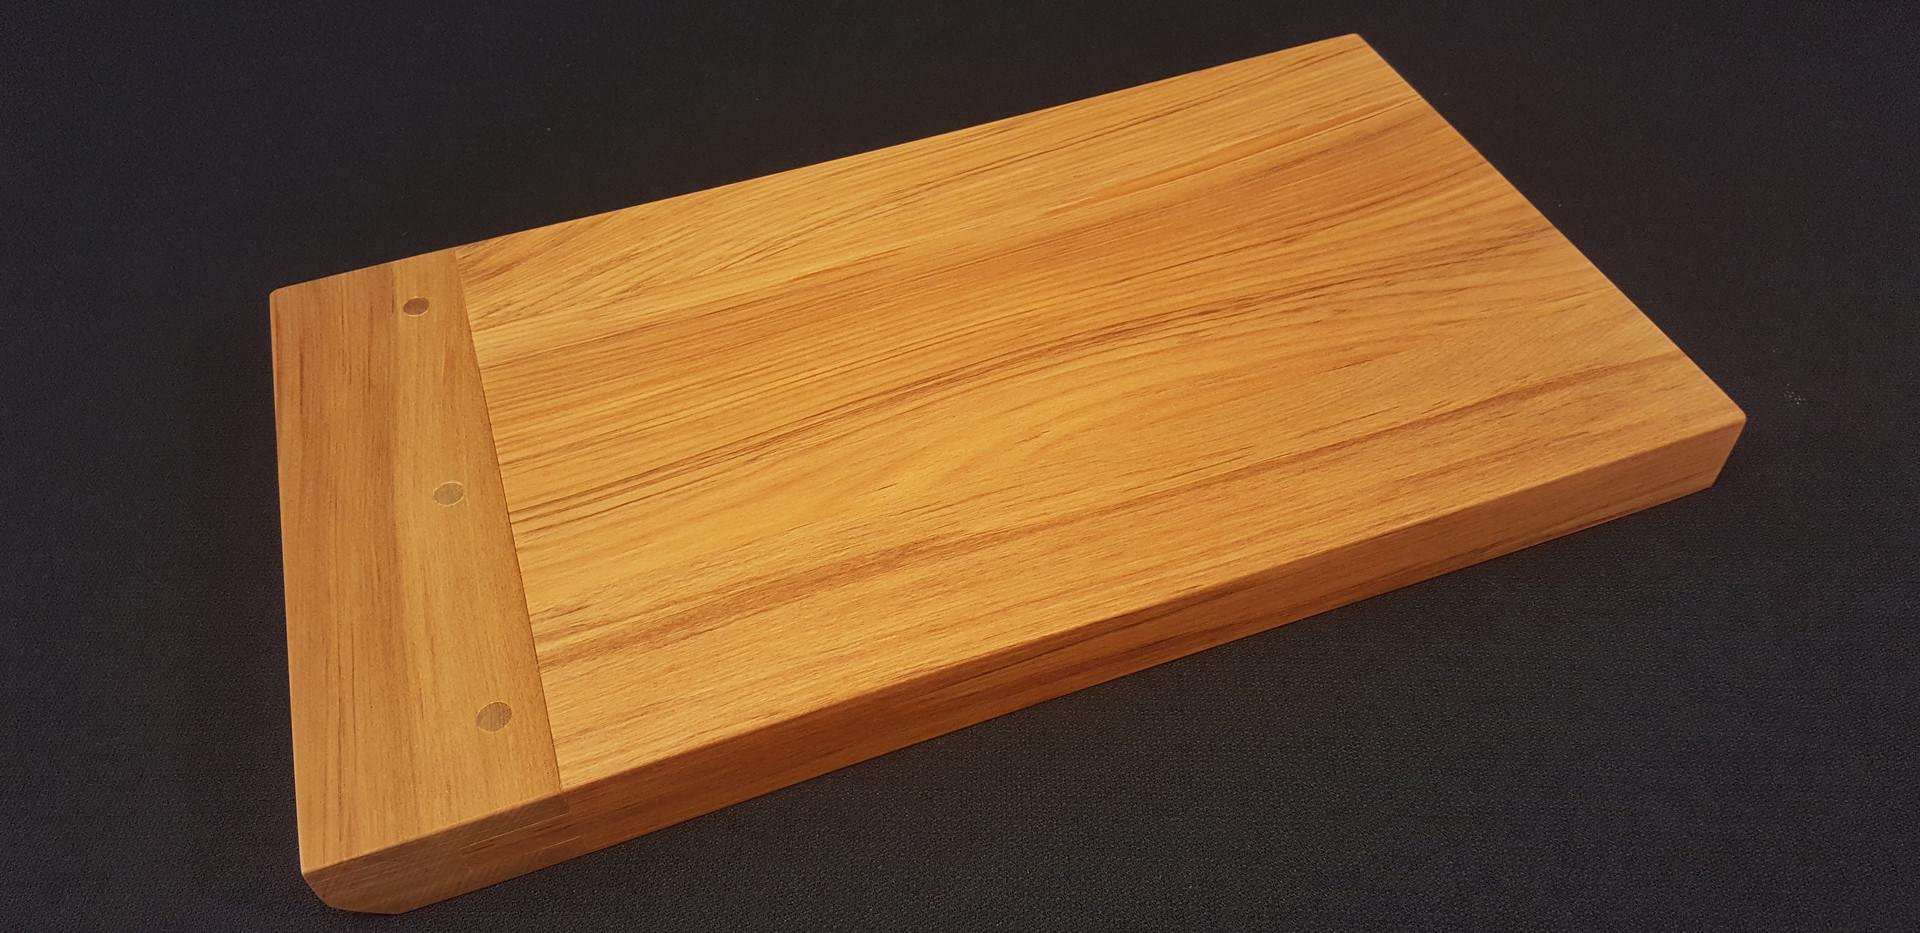 Breadboard end Sharing Platter in rimu